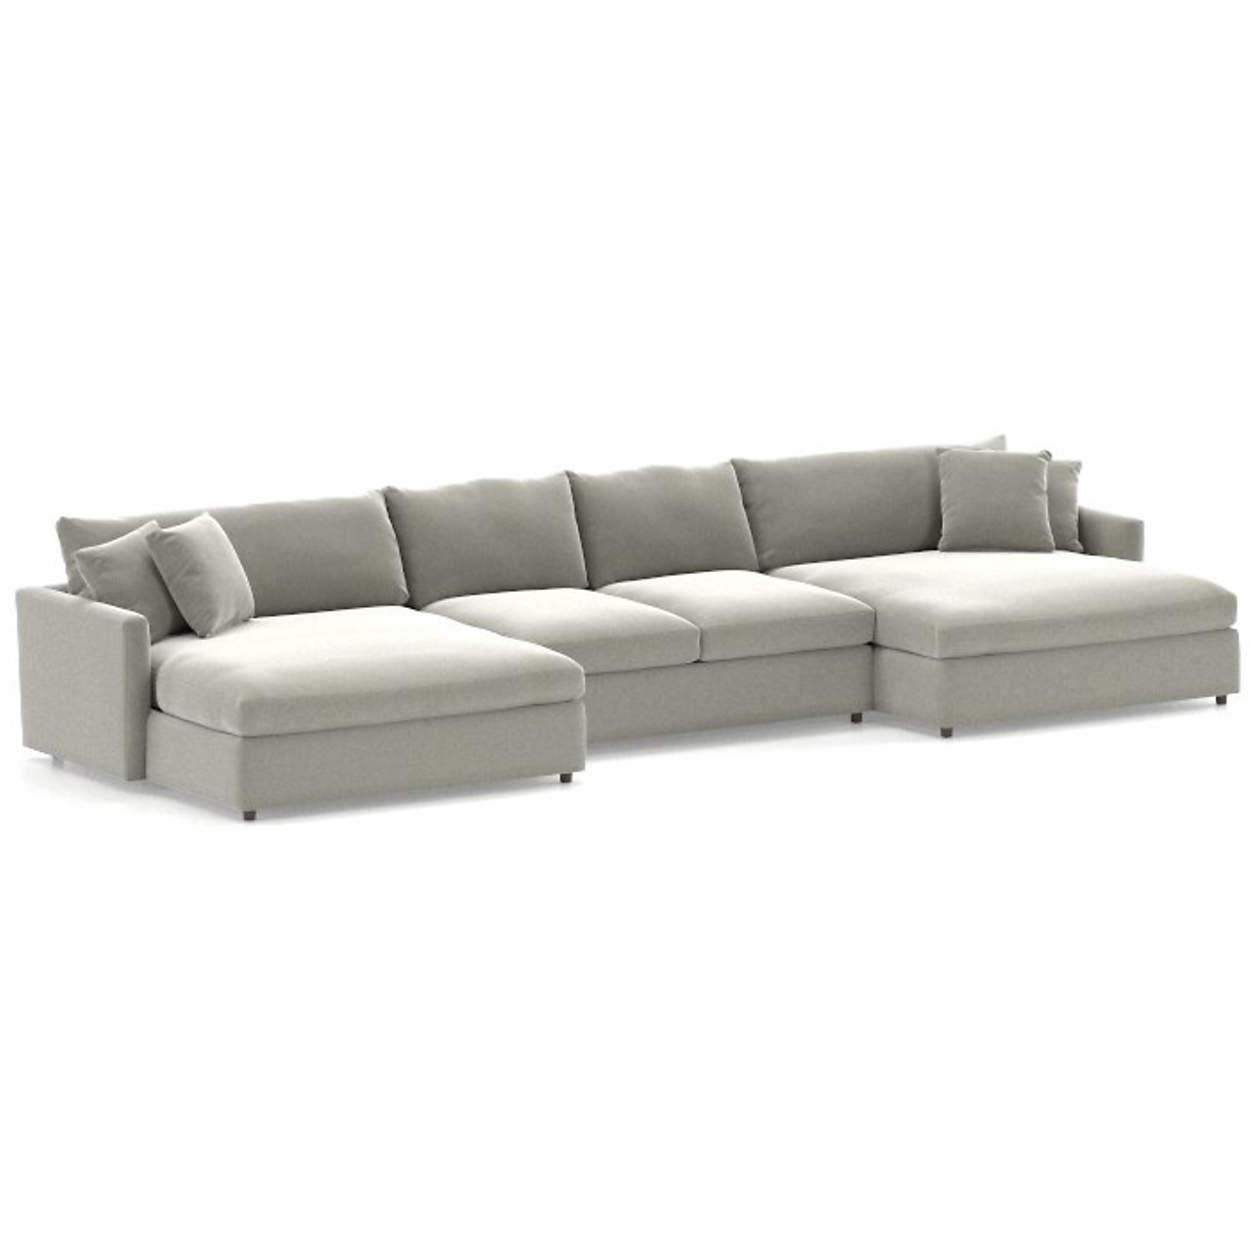 lounge ii 3 piece double chaise sectional sofa